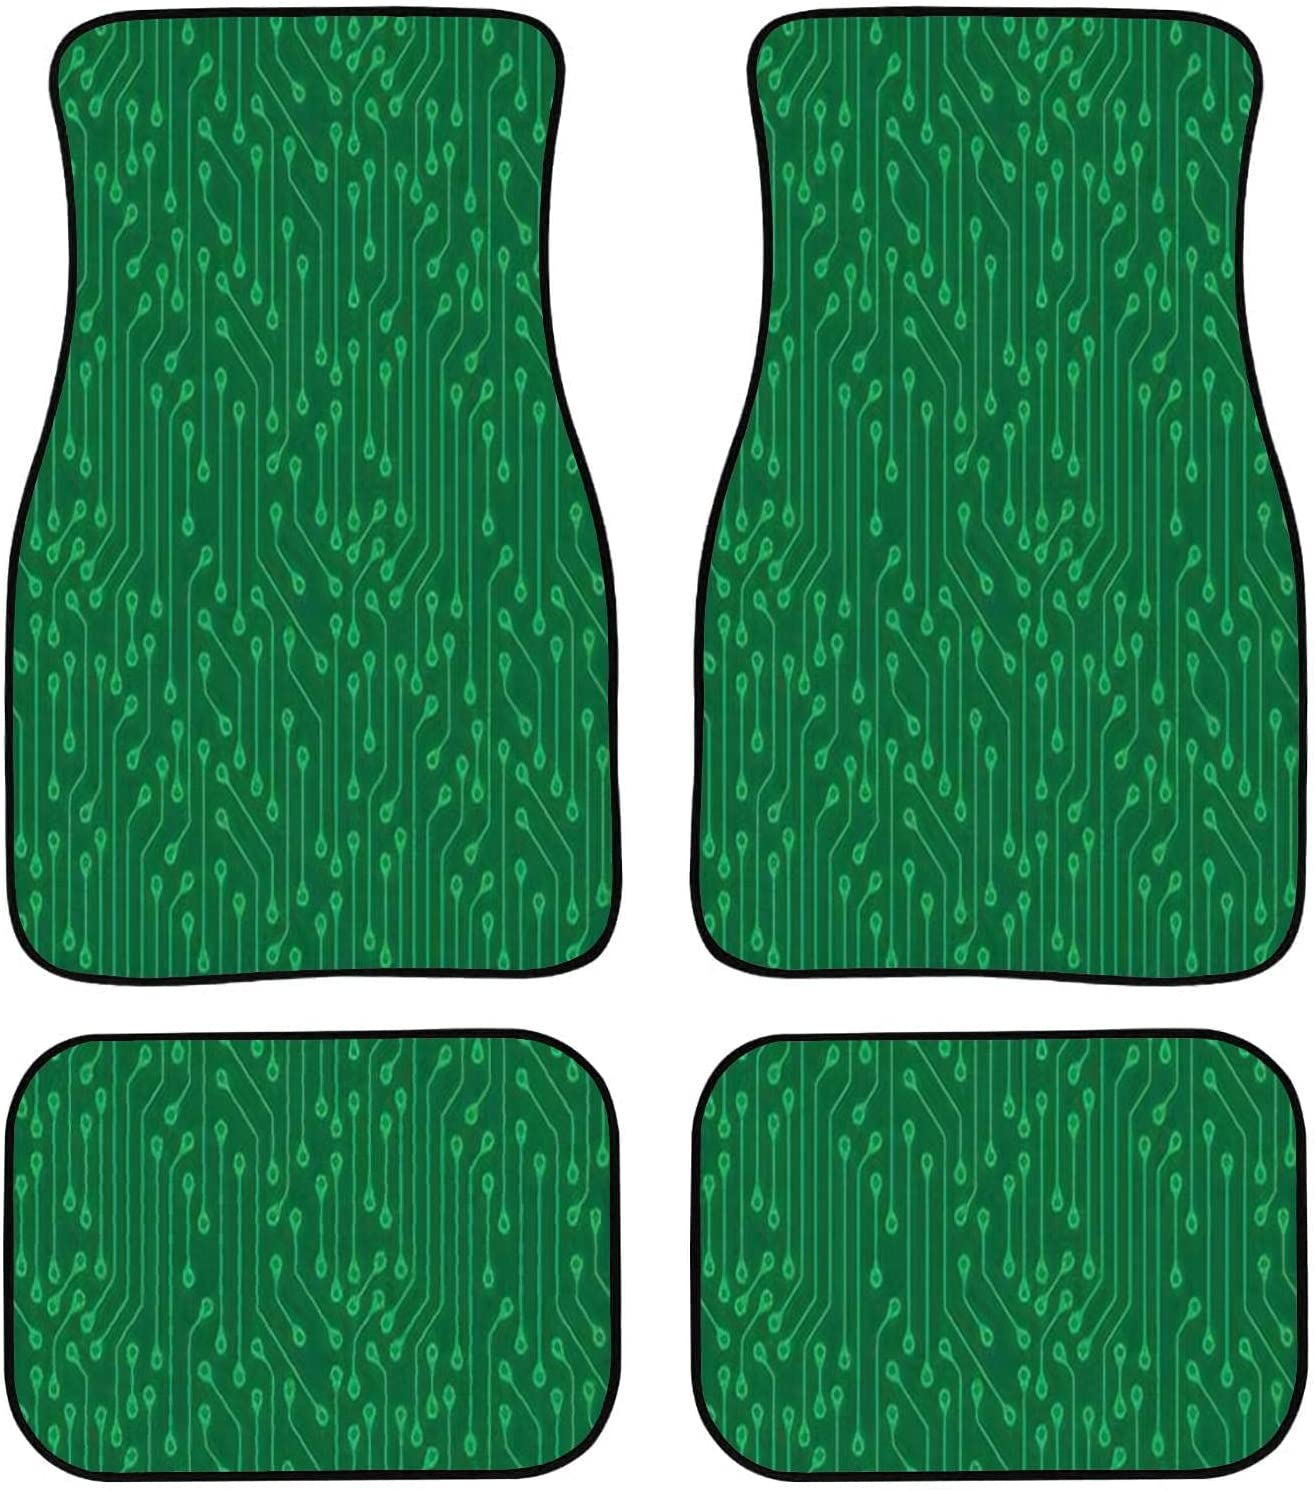 OBIEORNNCFUJ Chicago Mall Car Floor Mats - Cheap mail order sales Pattern Electron of Seamless Green